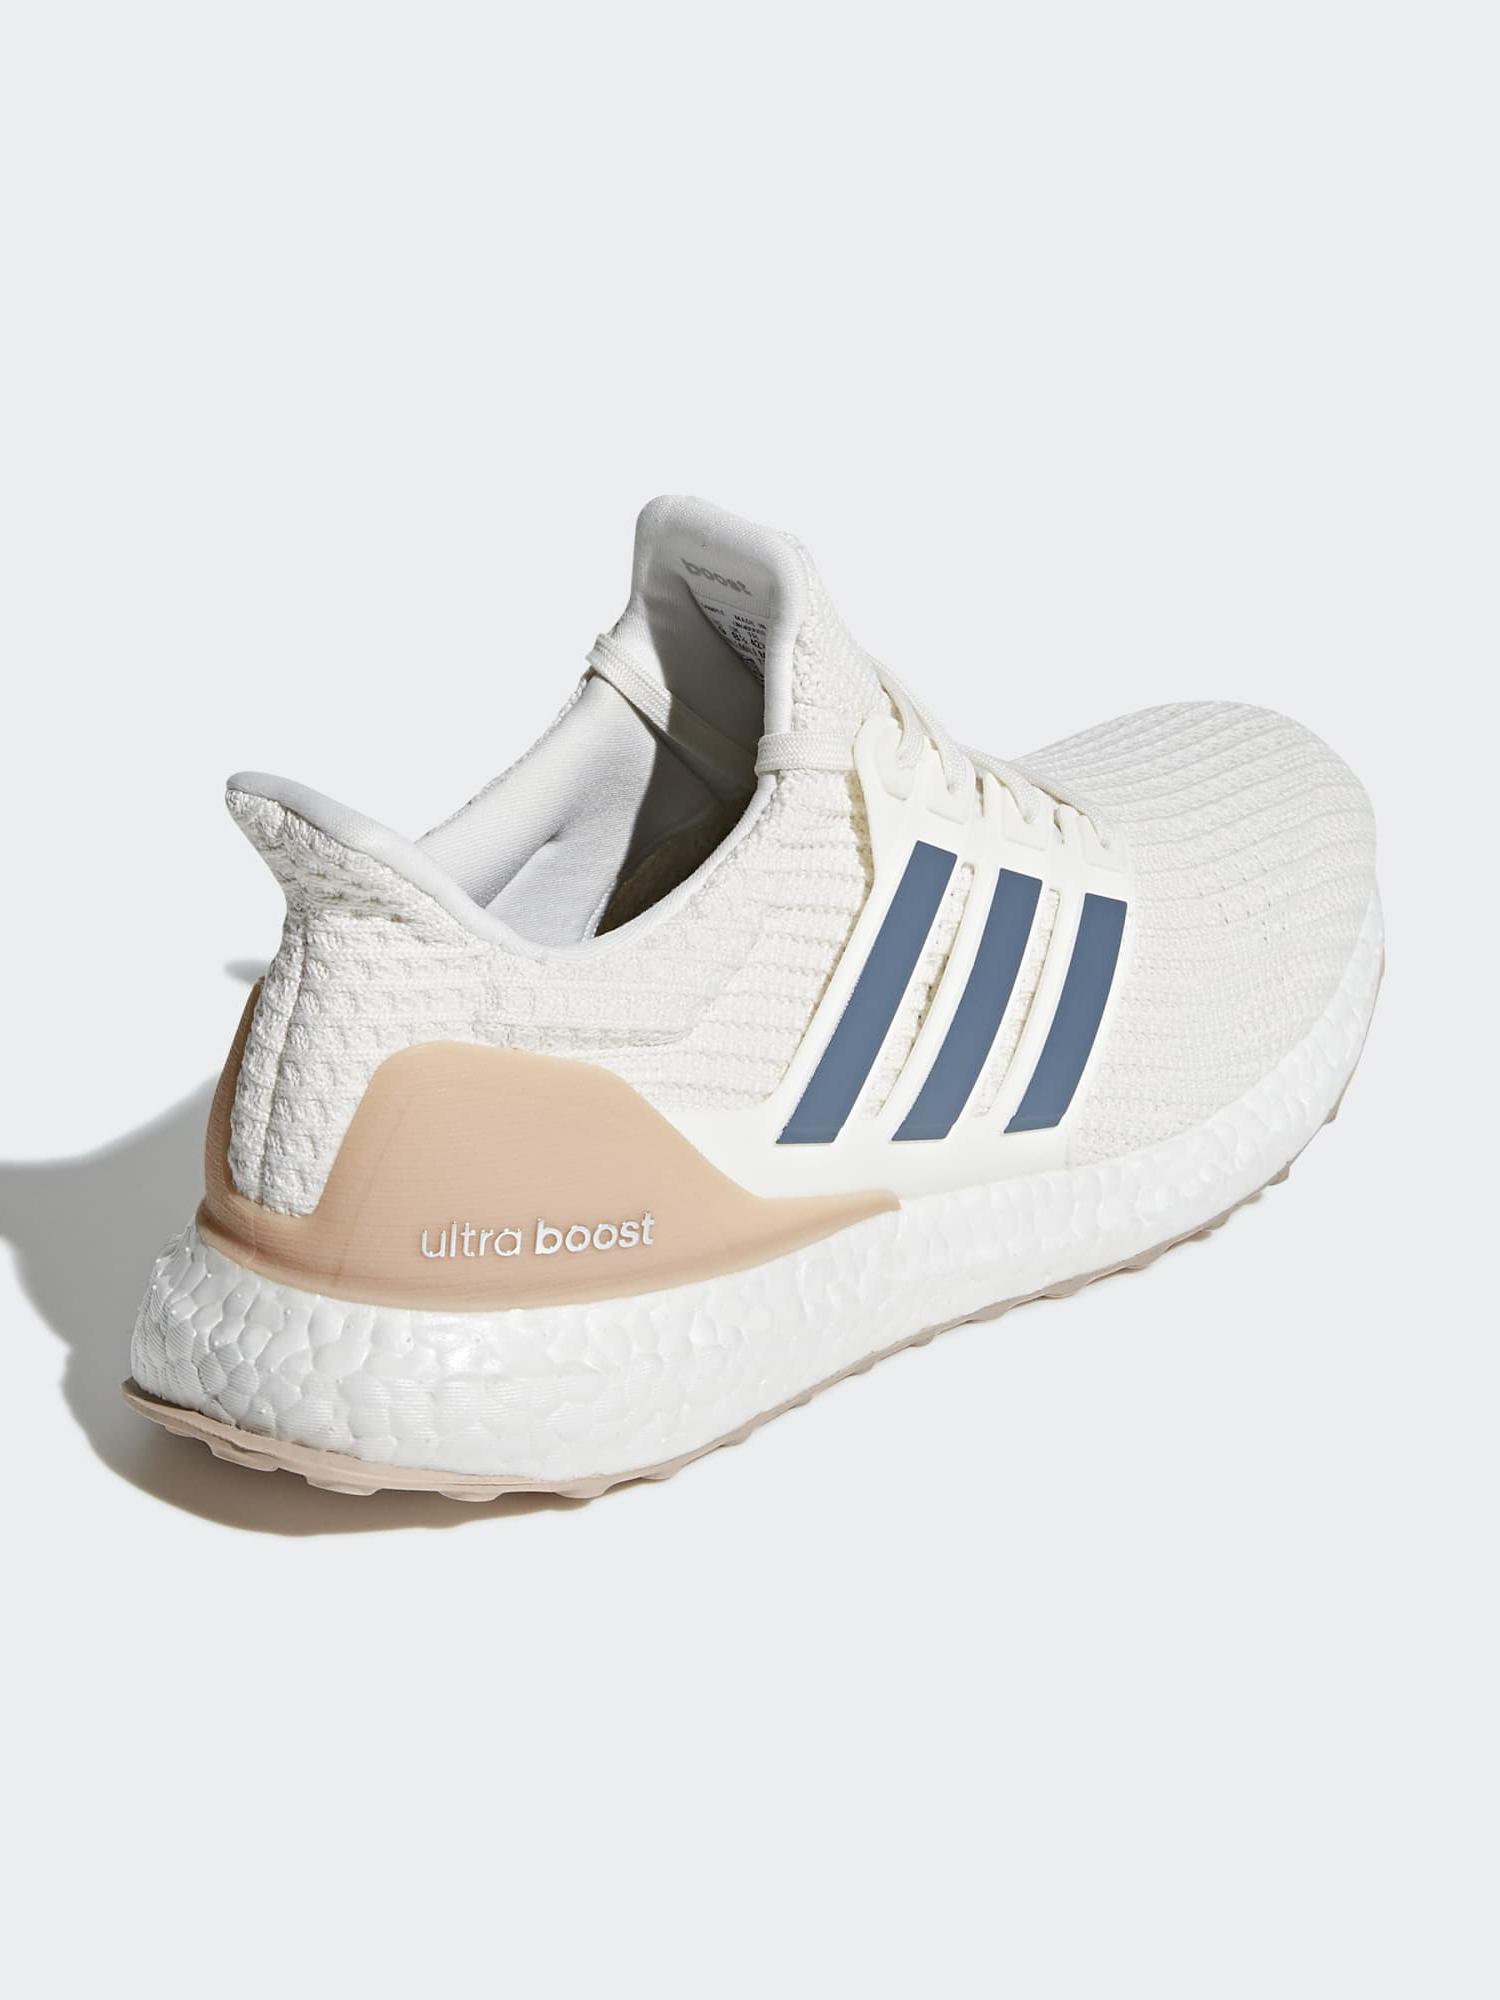 Adidas x Holi Pharrell Williams NMD Hu Holi x Blank Canvas in Triple blanc - UK 6 cb4577